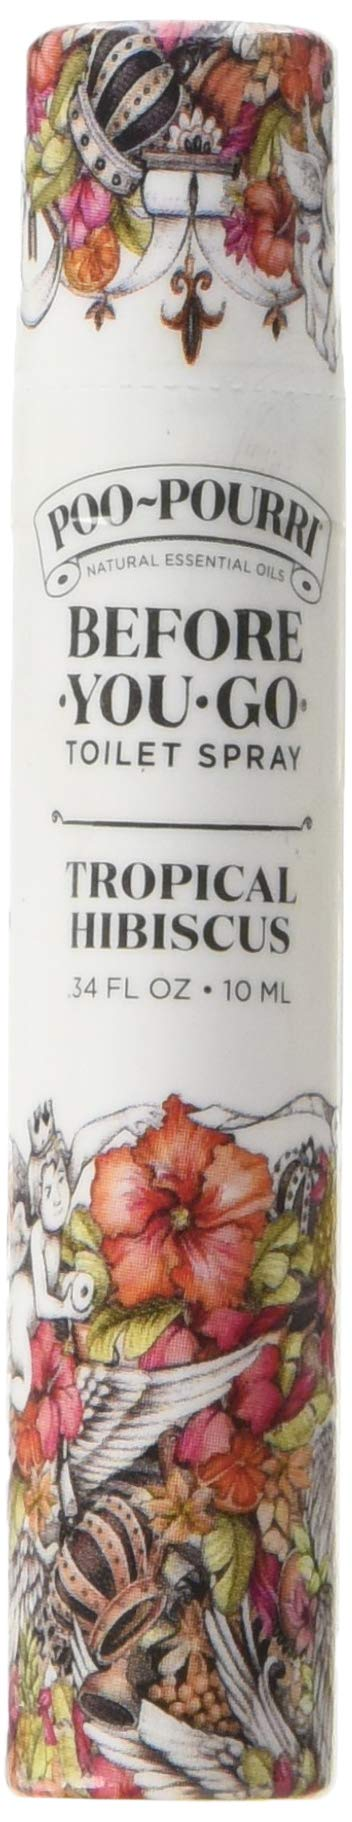 Poo-Pourri Before-You-Go Toilet Spray 10-ML Travel Size, Tropical Hibiscus Scent